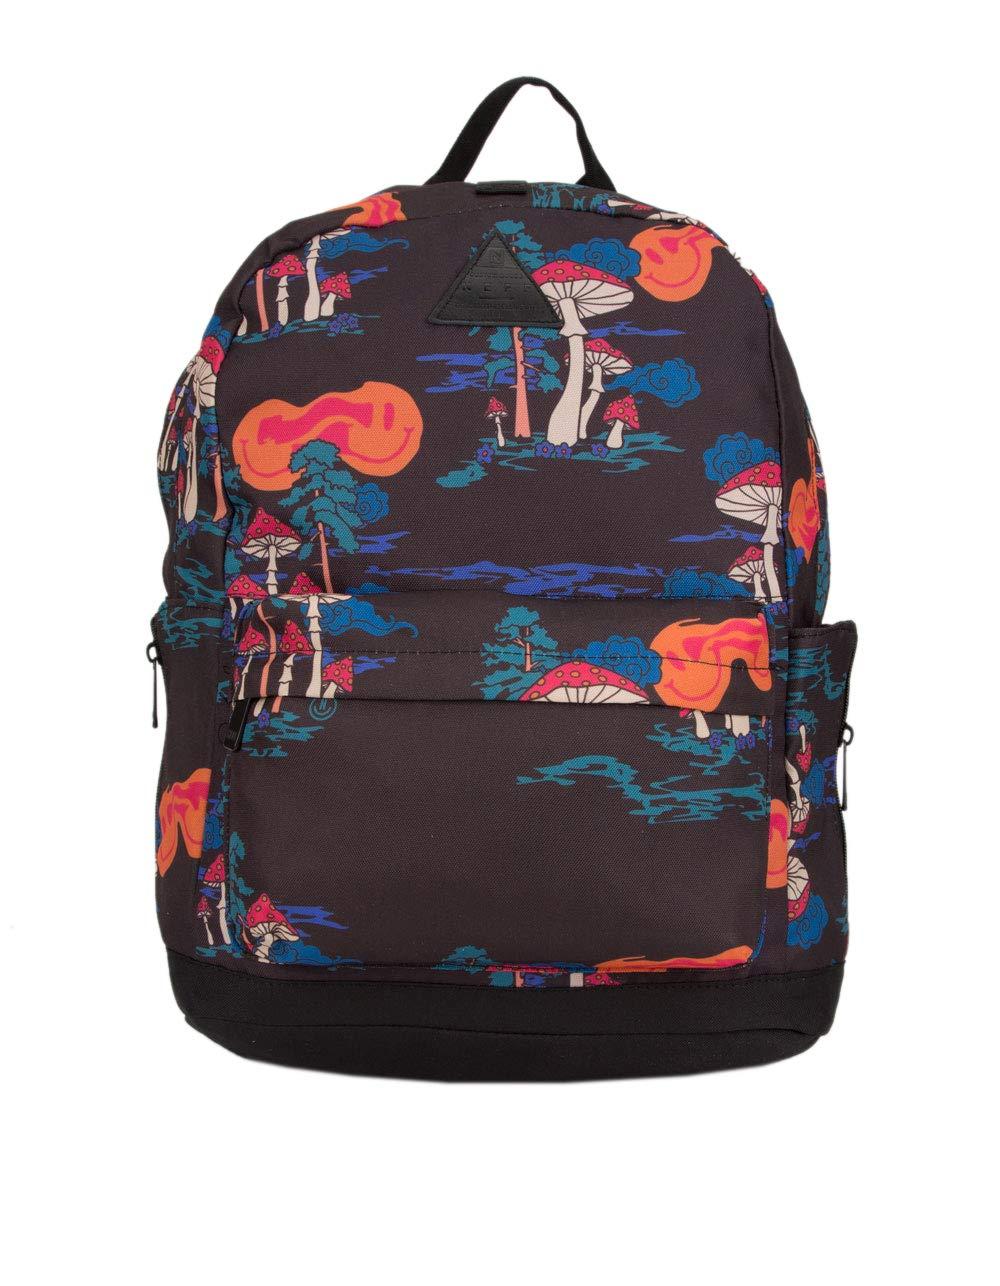 NEFF Professor XL Backpack, Funland by NEFF